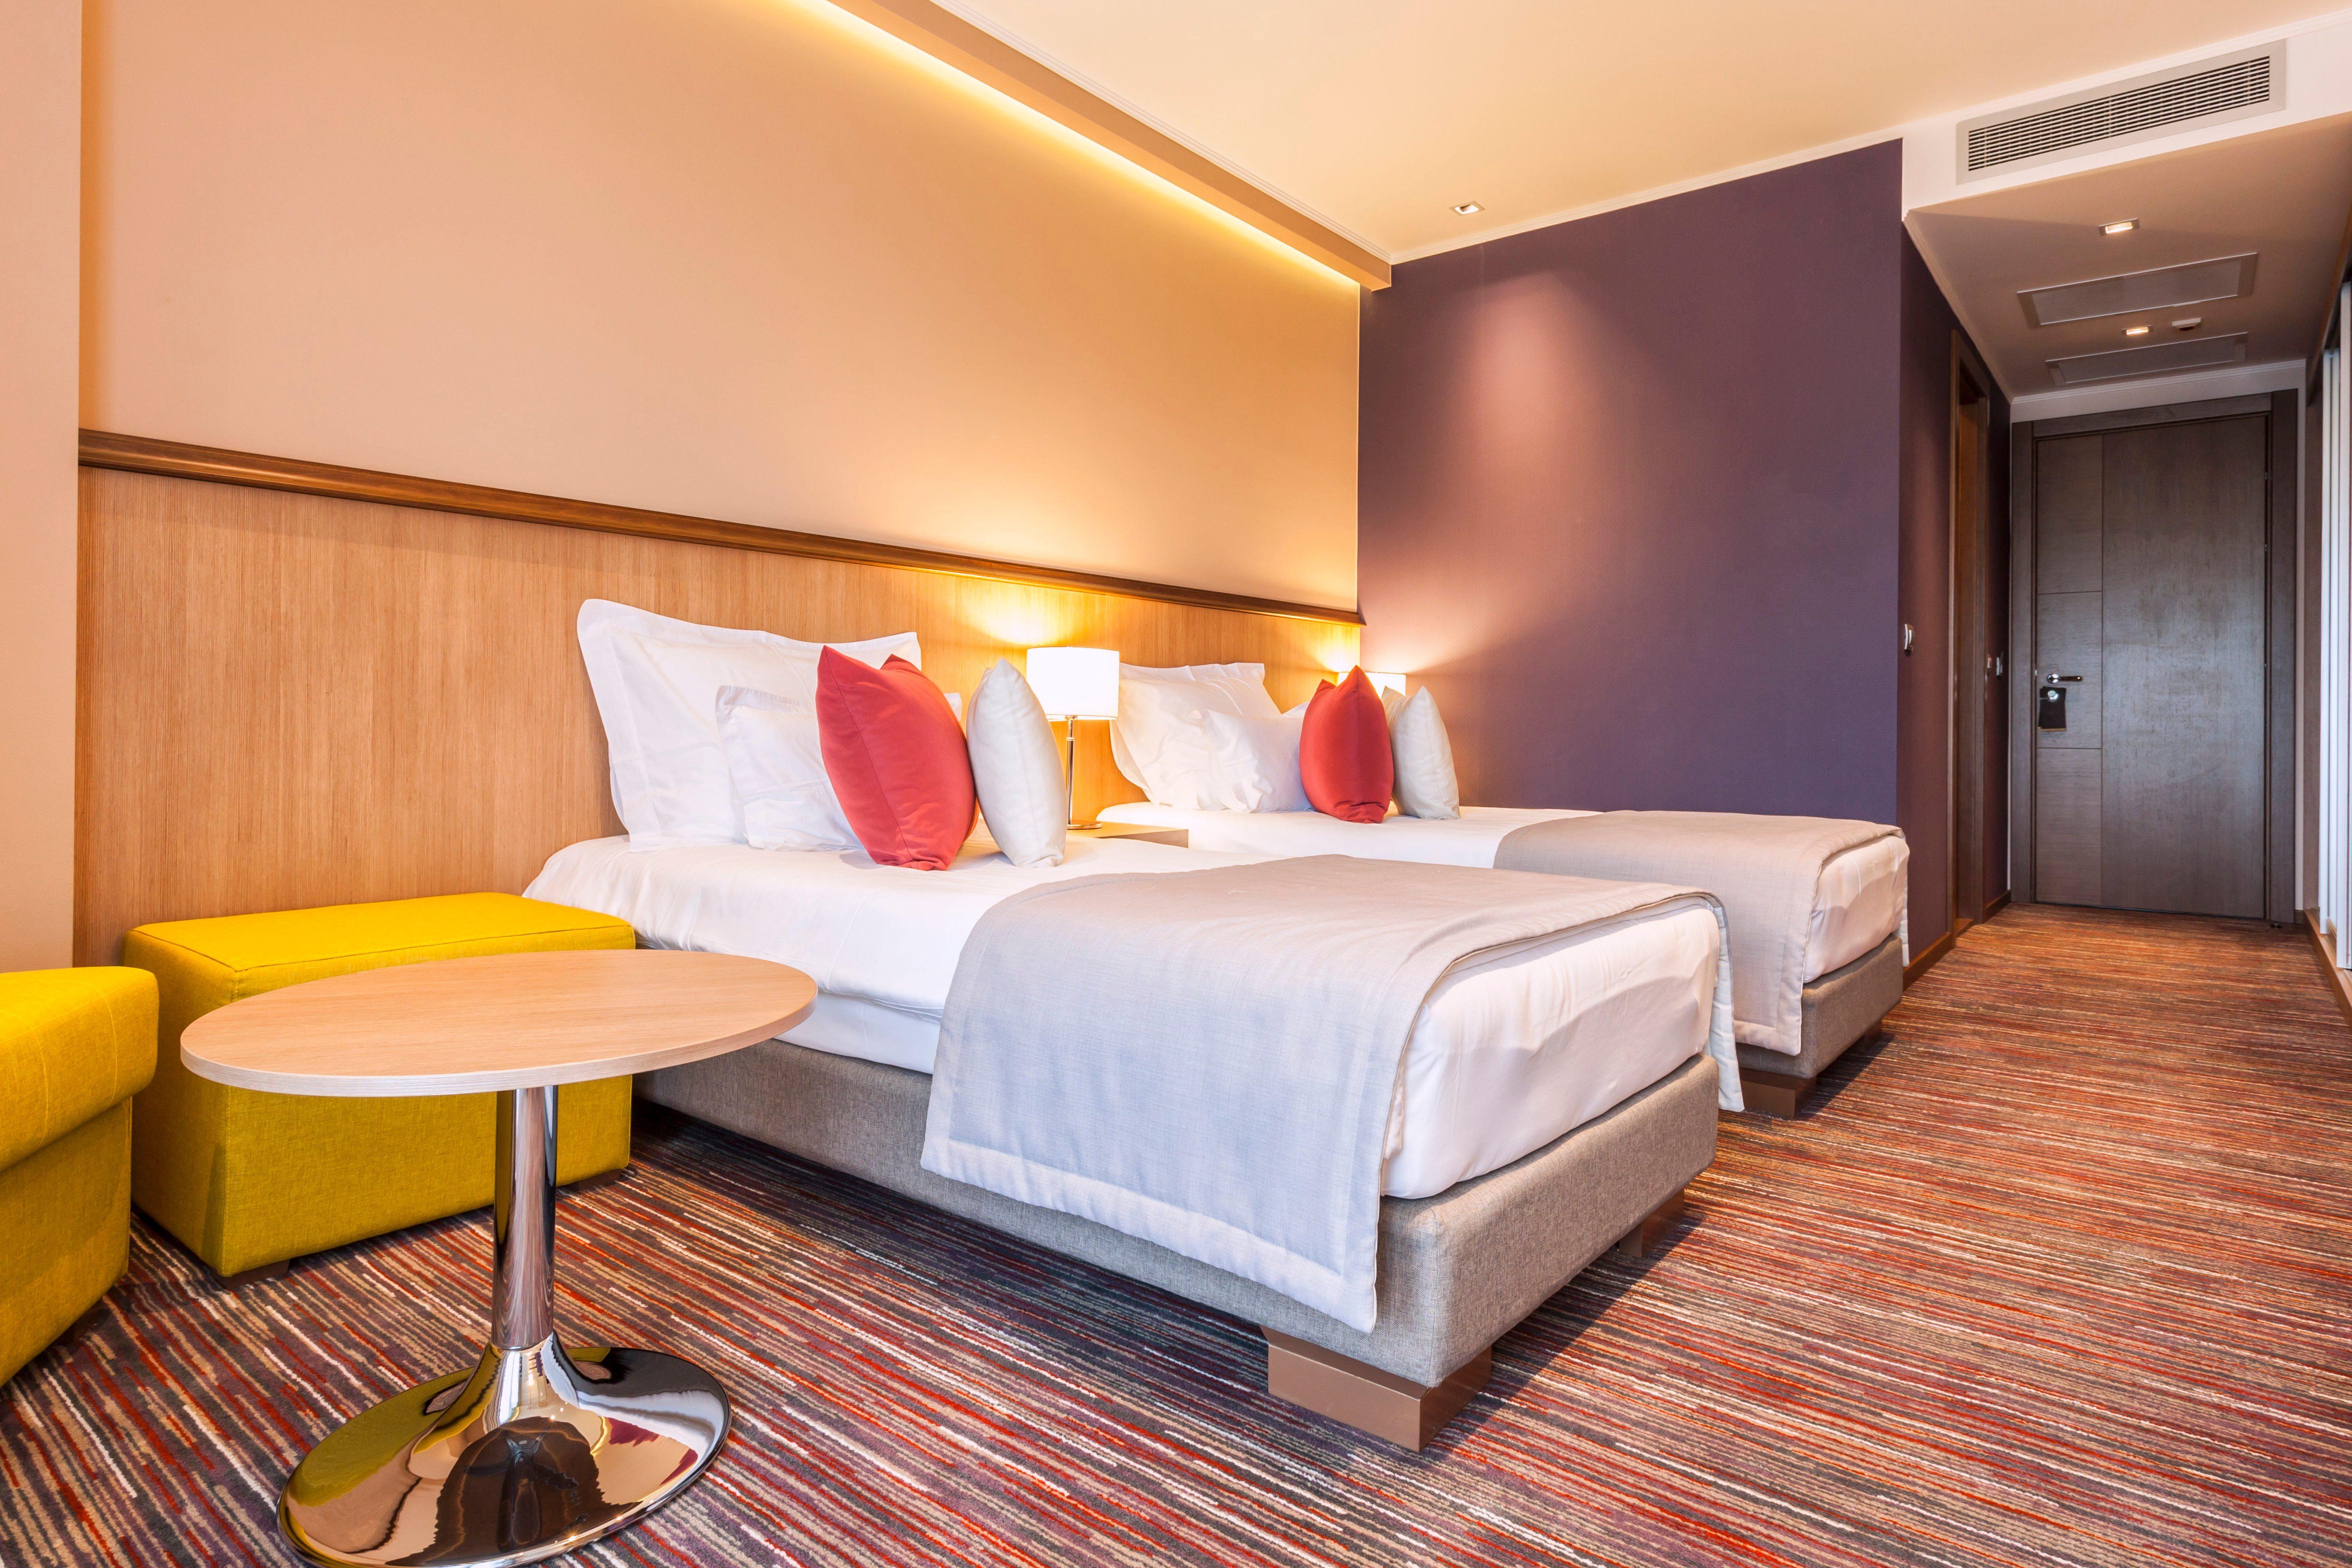 Colourful hotel room